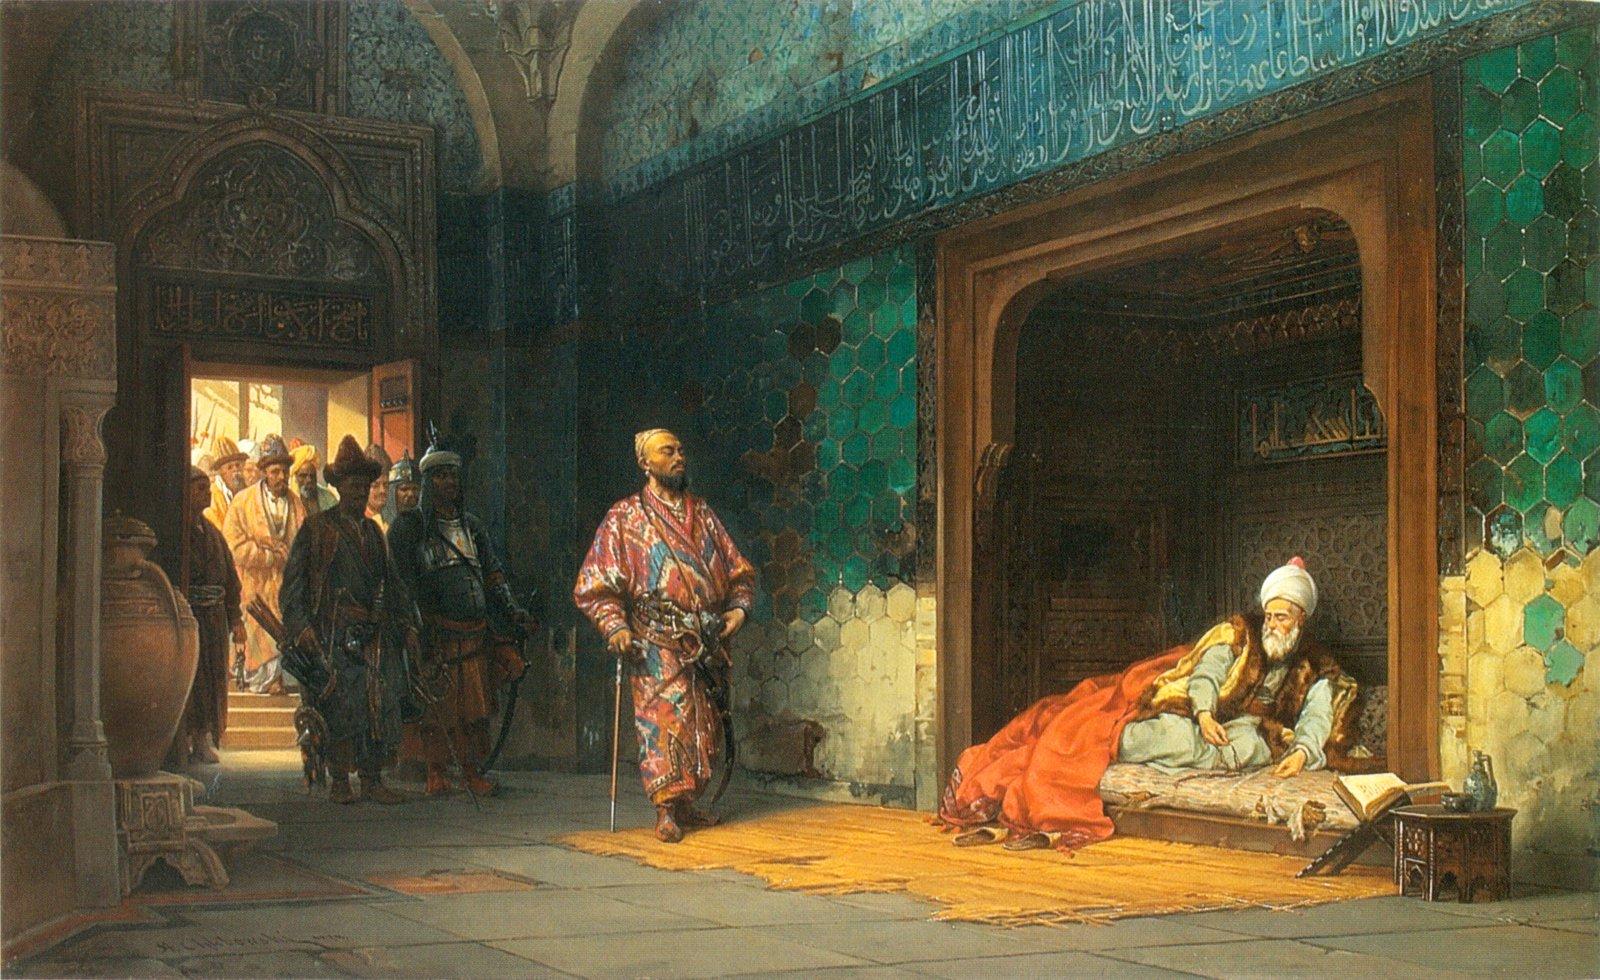 http://4.bp.blogspot.com/-m-WEY1cuoAs/Tnzd-cKDeNI/AAAAAAAAOjY/WoYBLpEDeMs/s1600/Oriental+Painting+%252890%2529.jpg